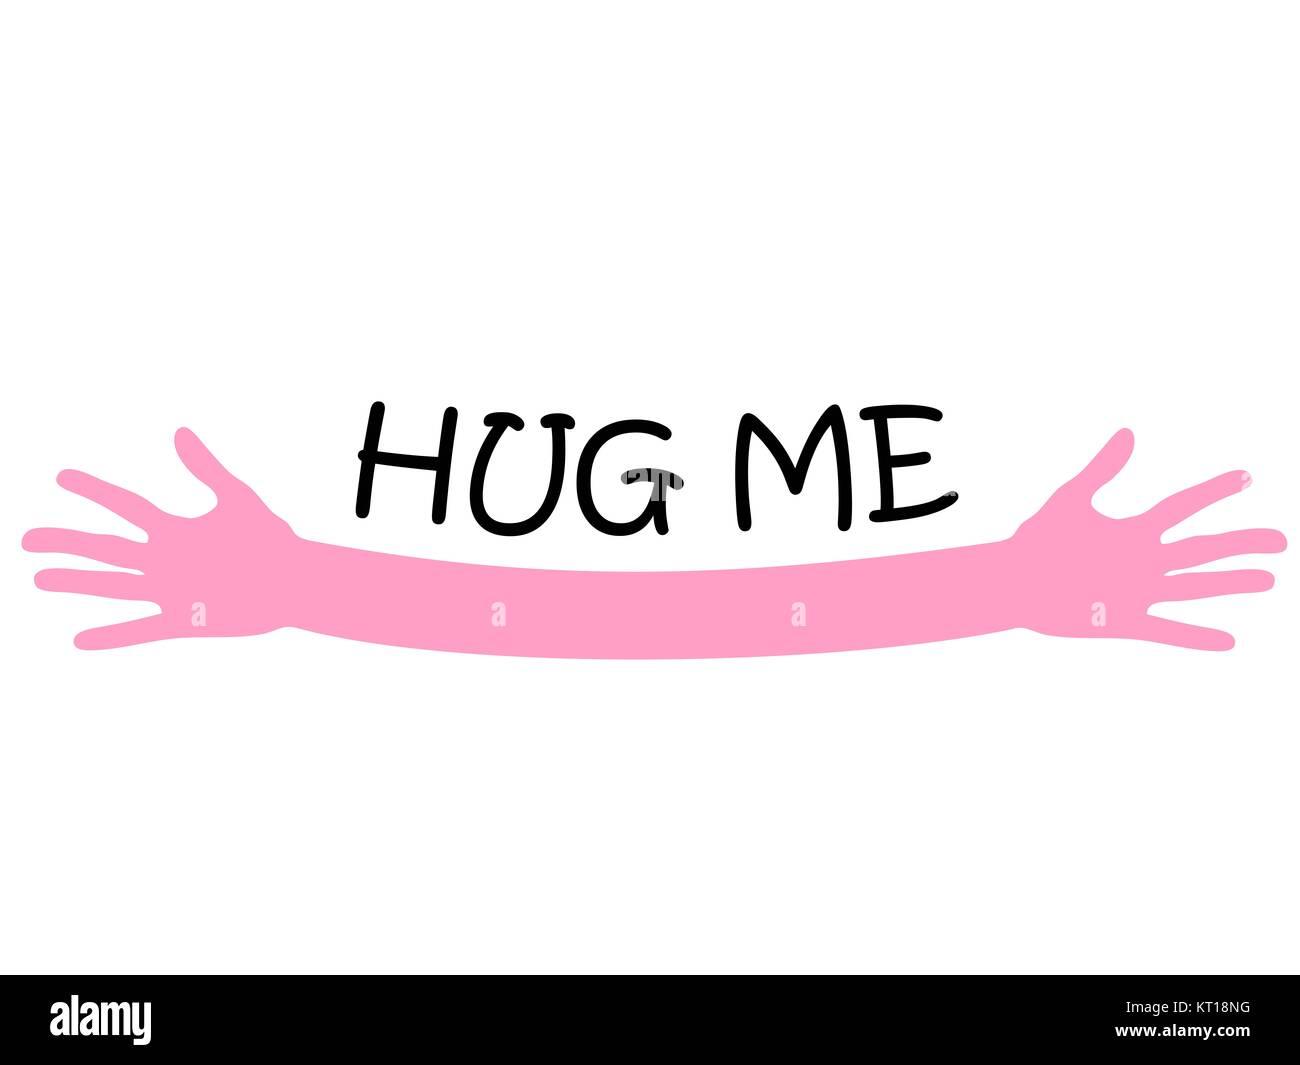 Hug me written above pink open arms hands, vector - Stock Image